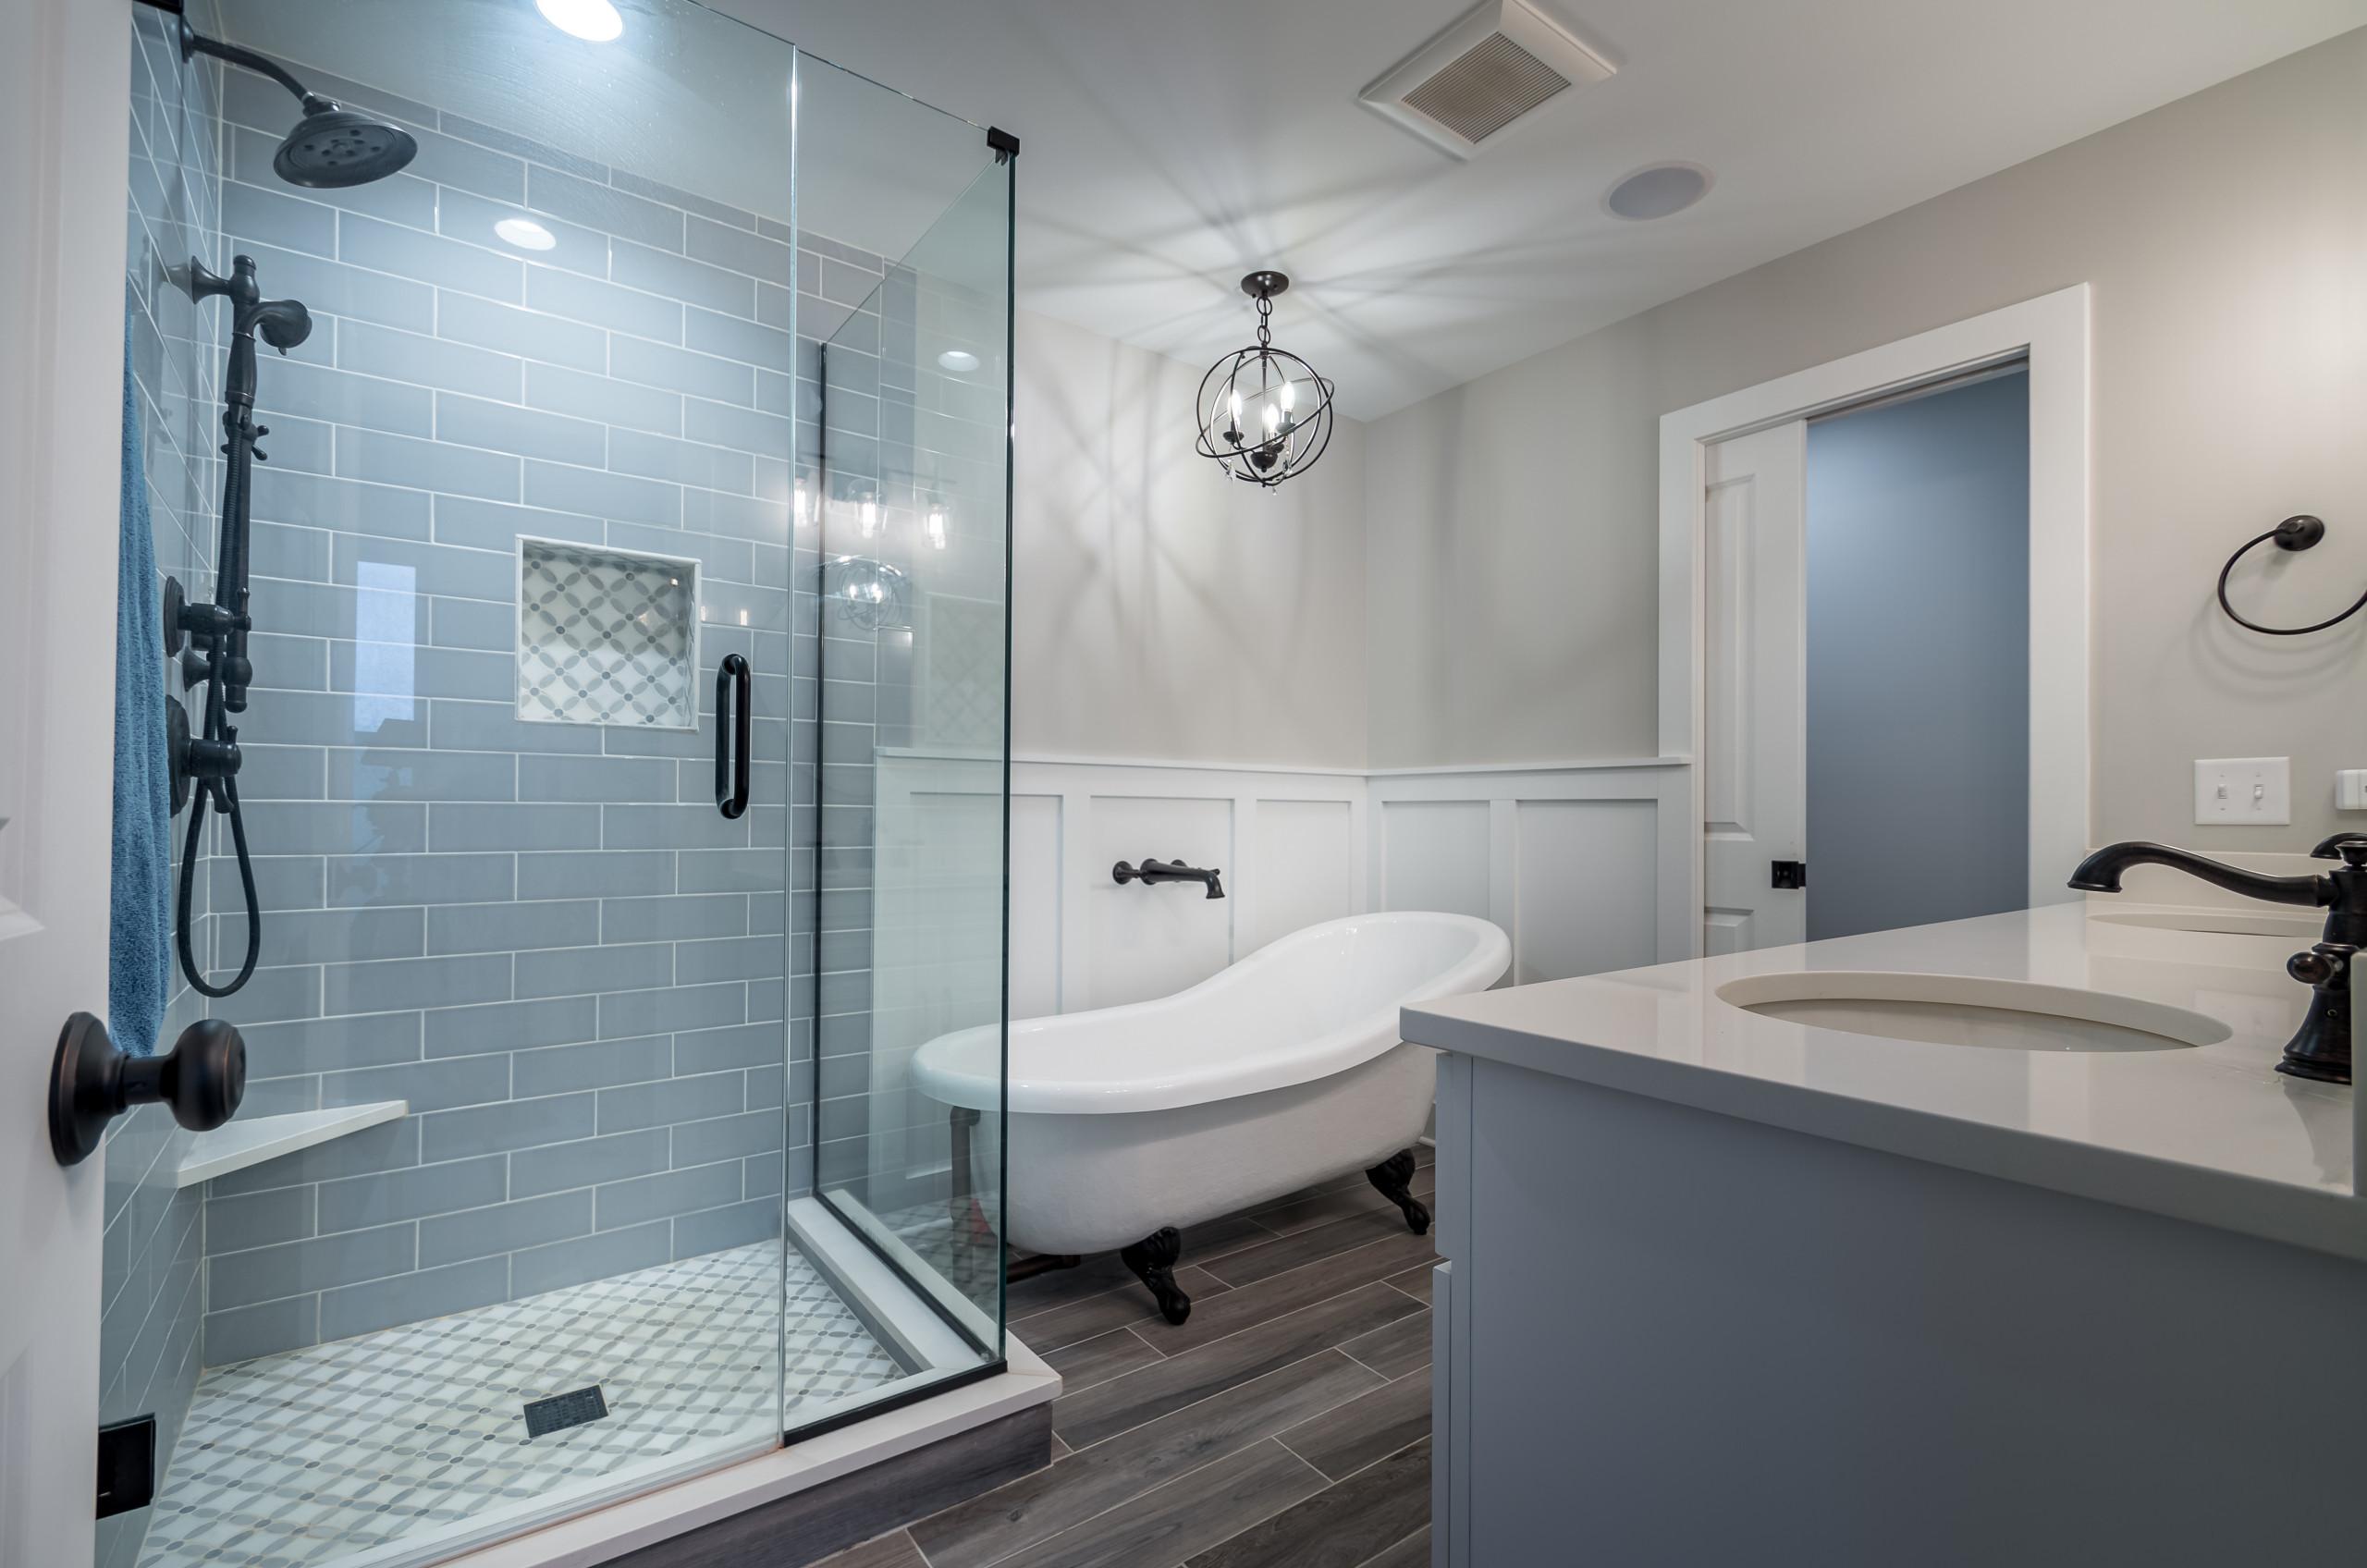 Historic Farmhouse Master Bathroom